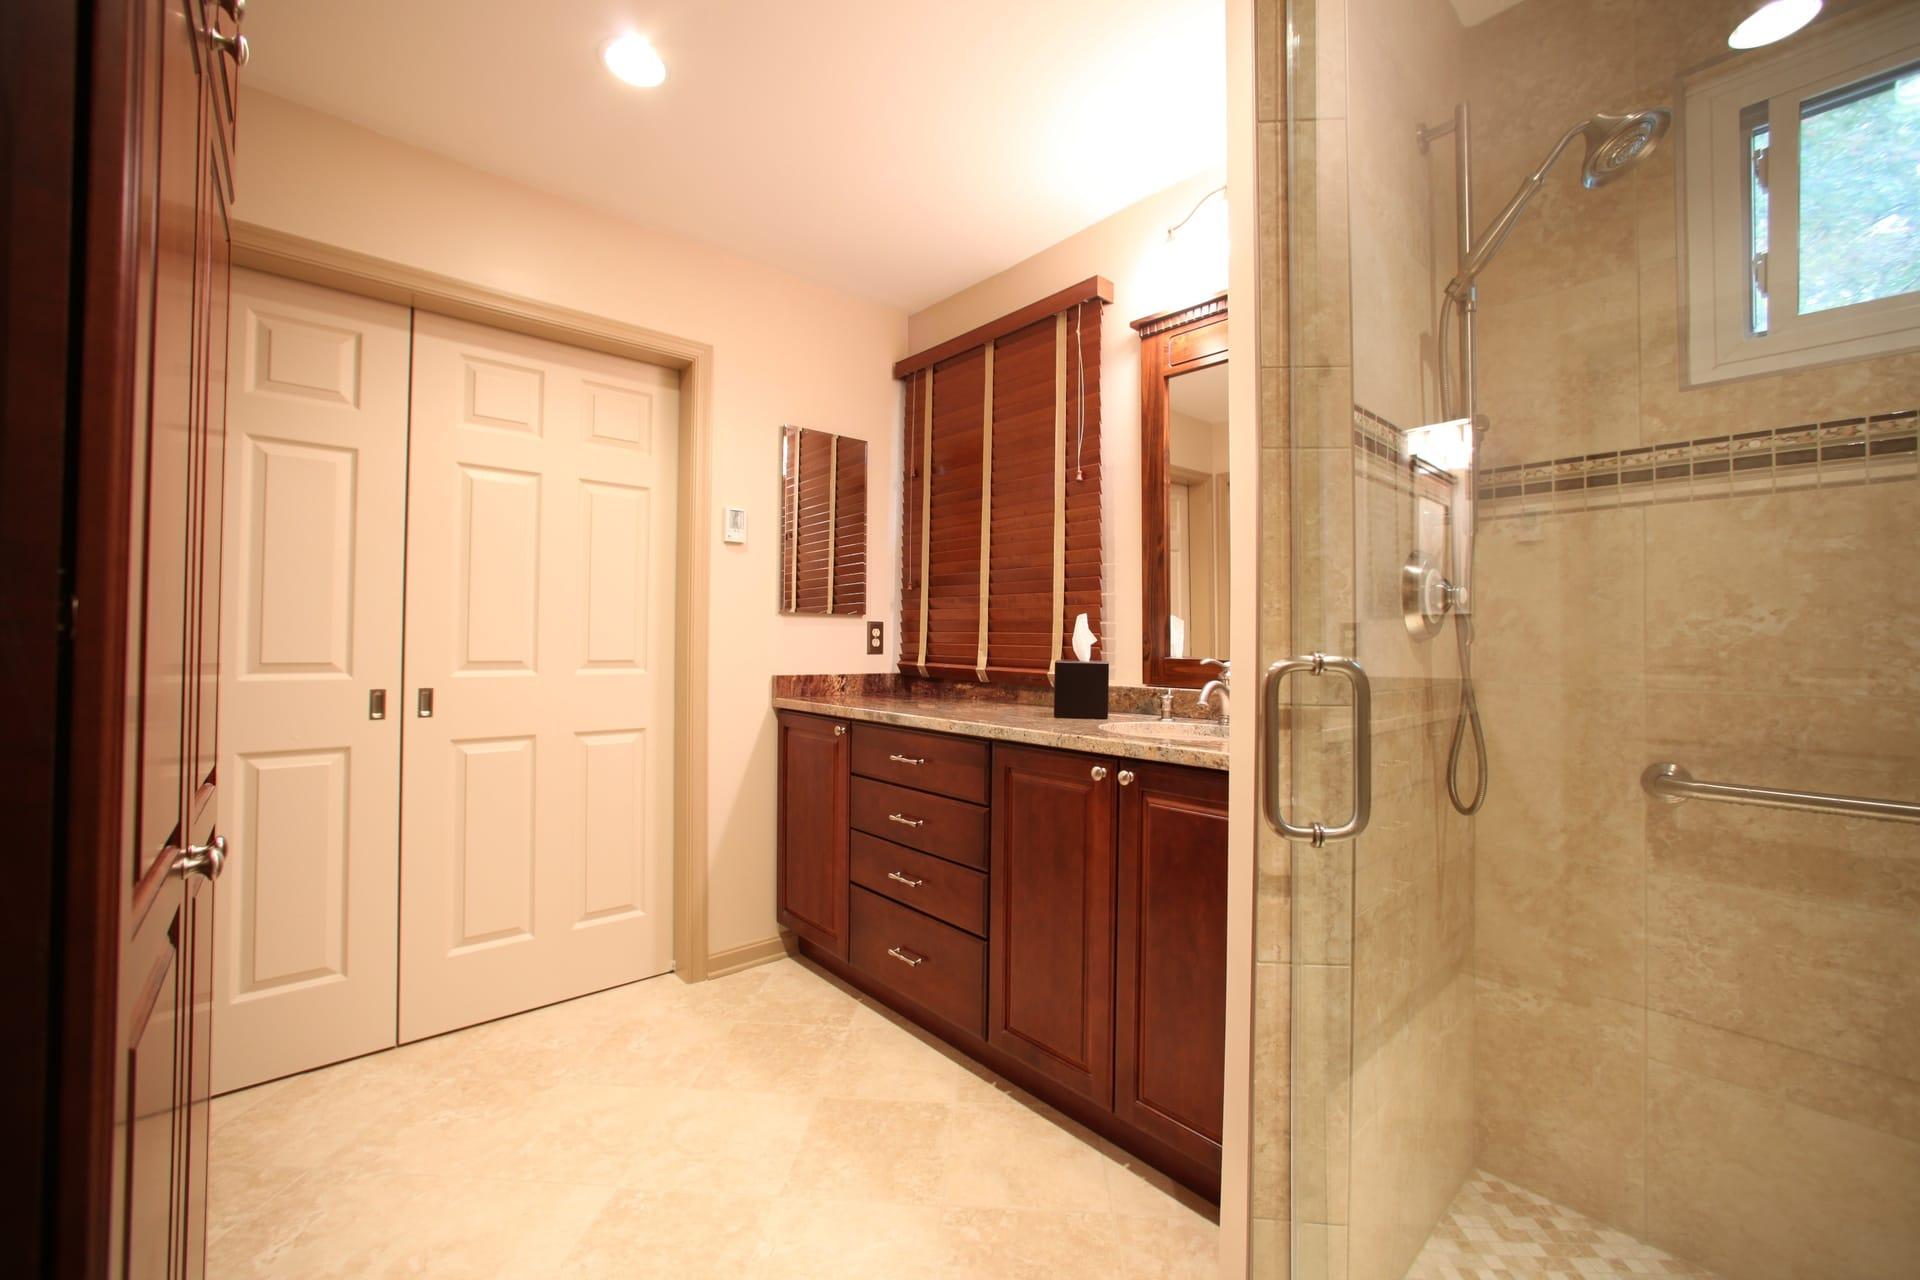 Bathroom Remodel - Hambleton Construction (6)